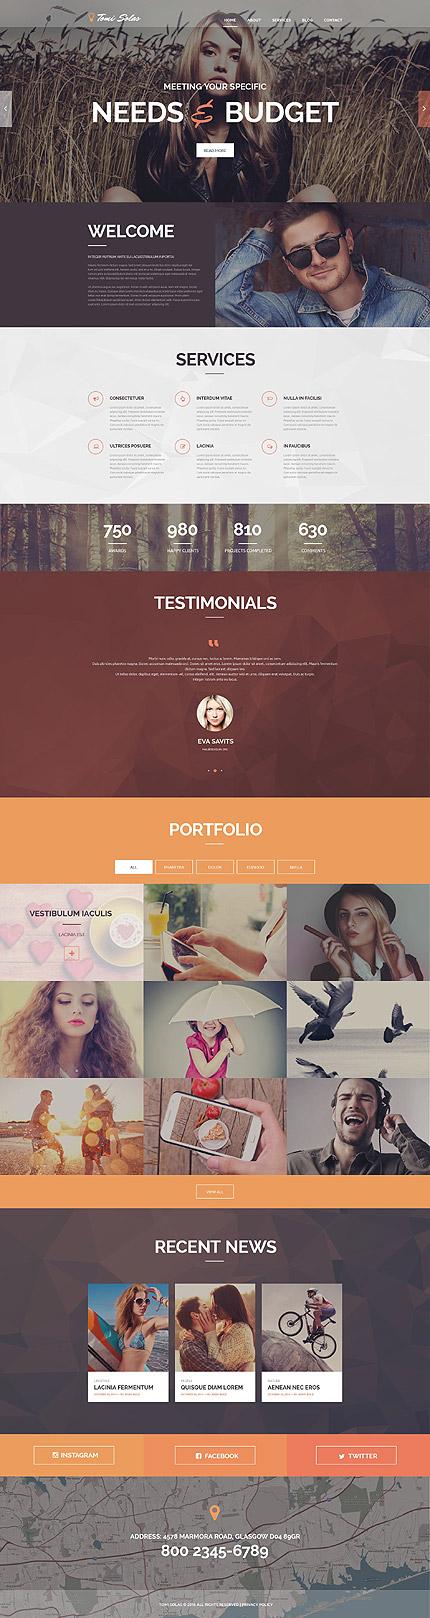 PSD макет сайта №55909